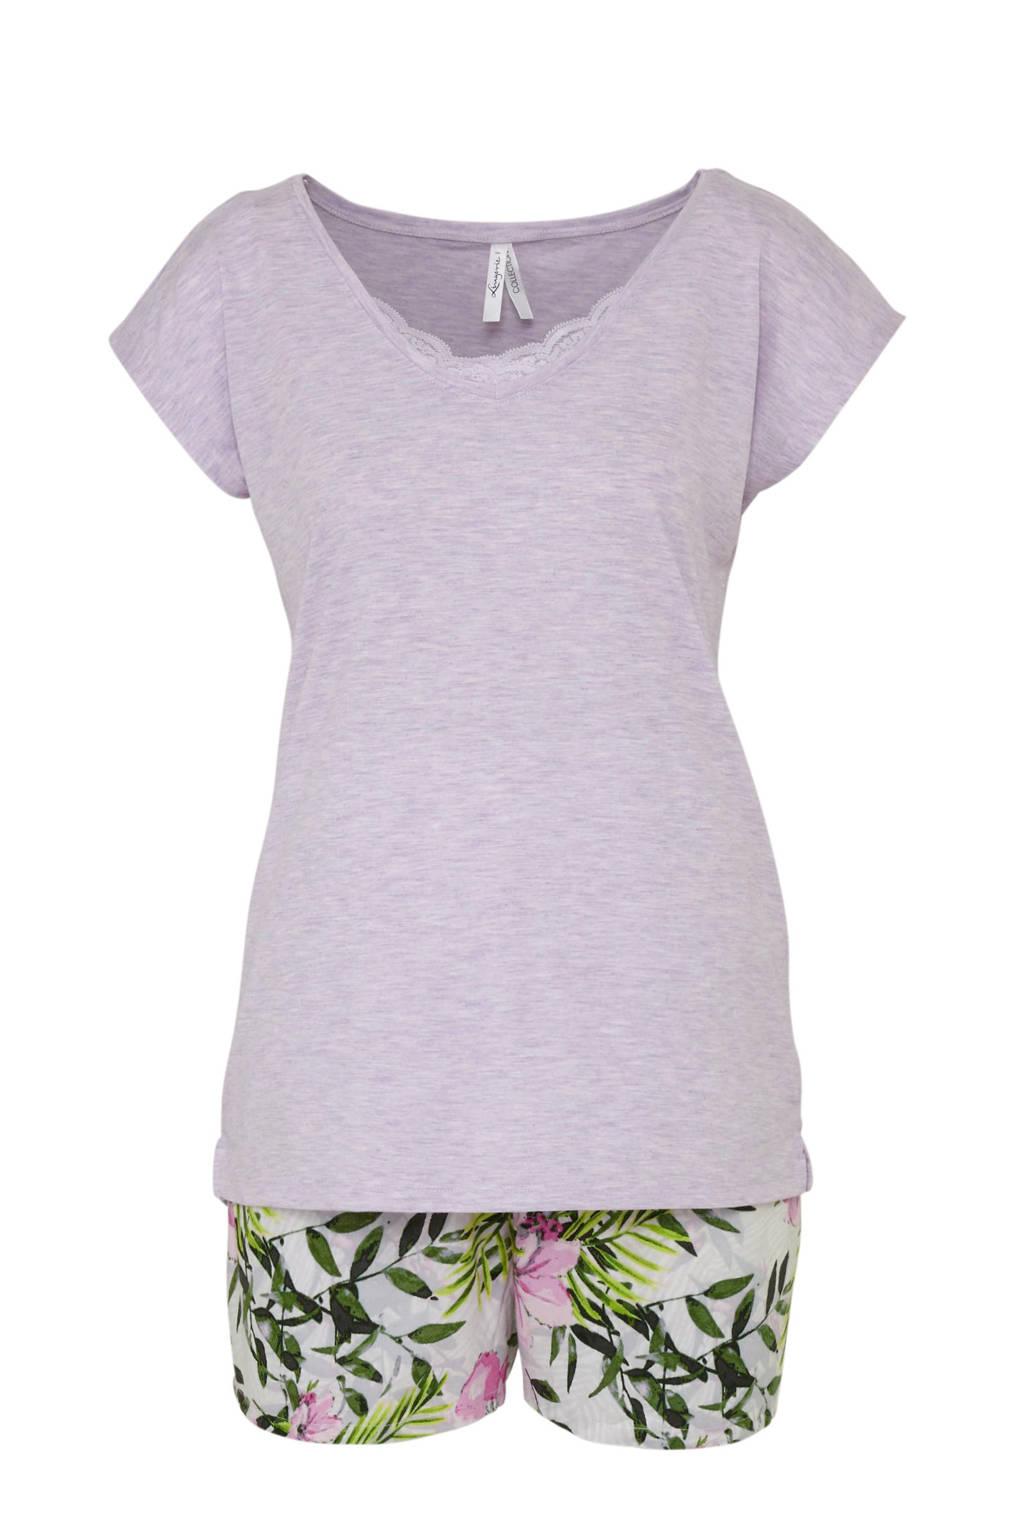 C&A shortama met printopdruk lila, Lila/groen/roze